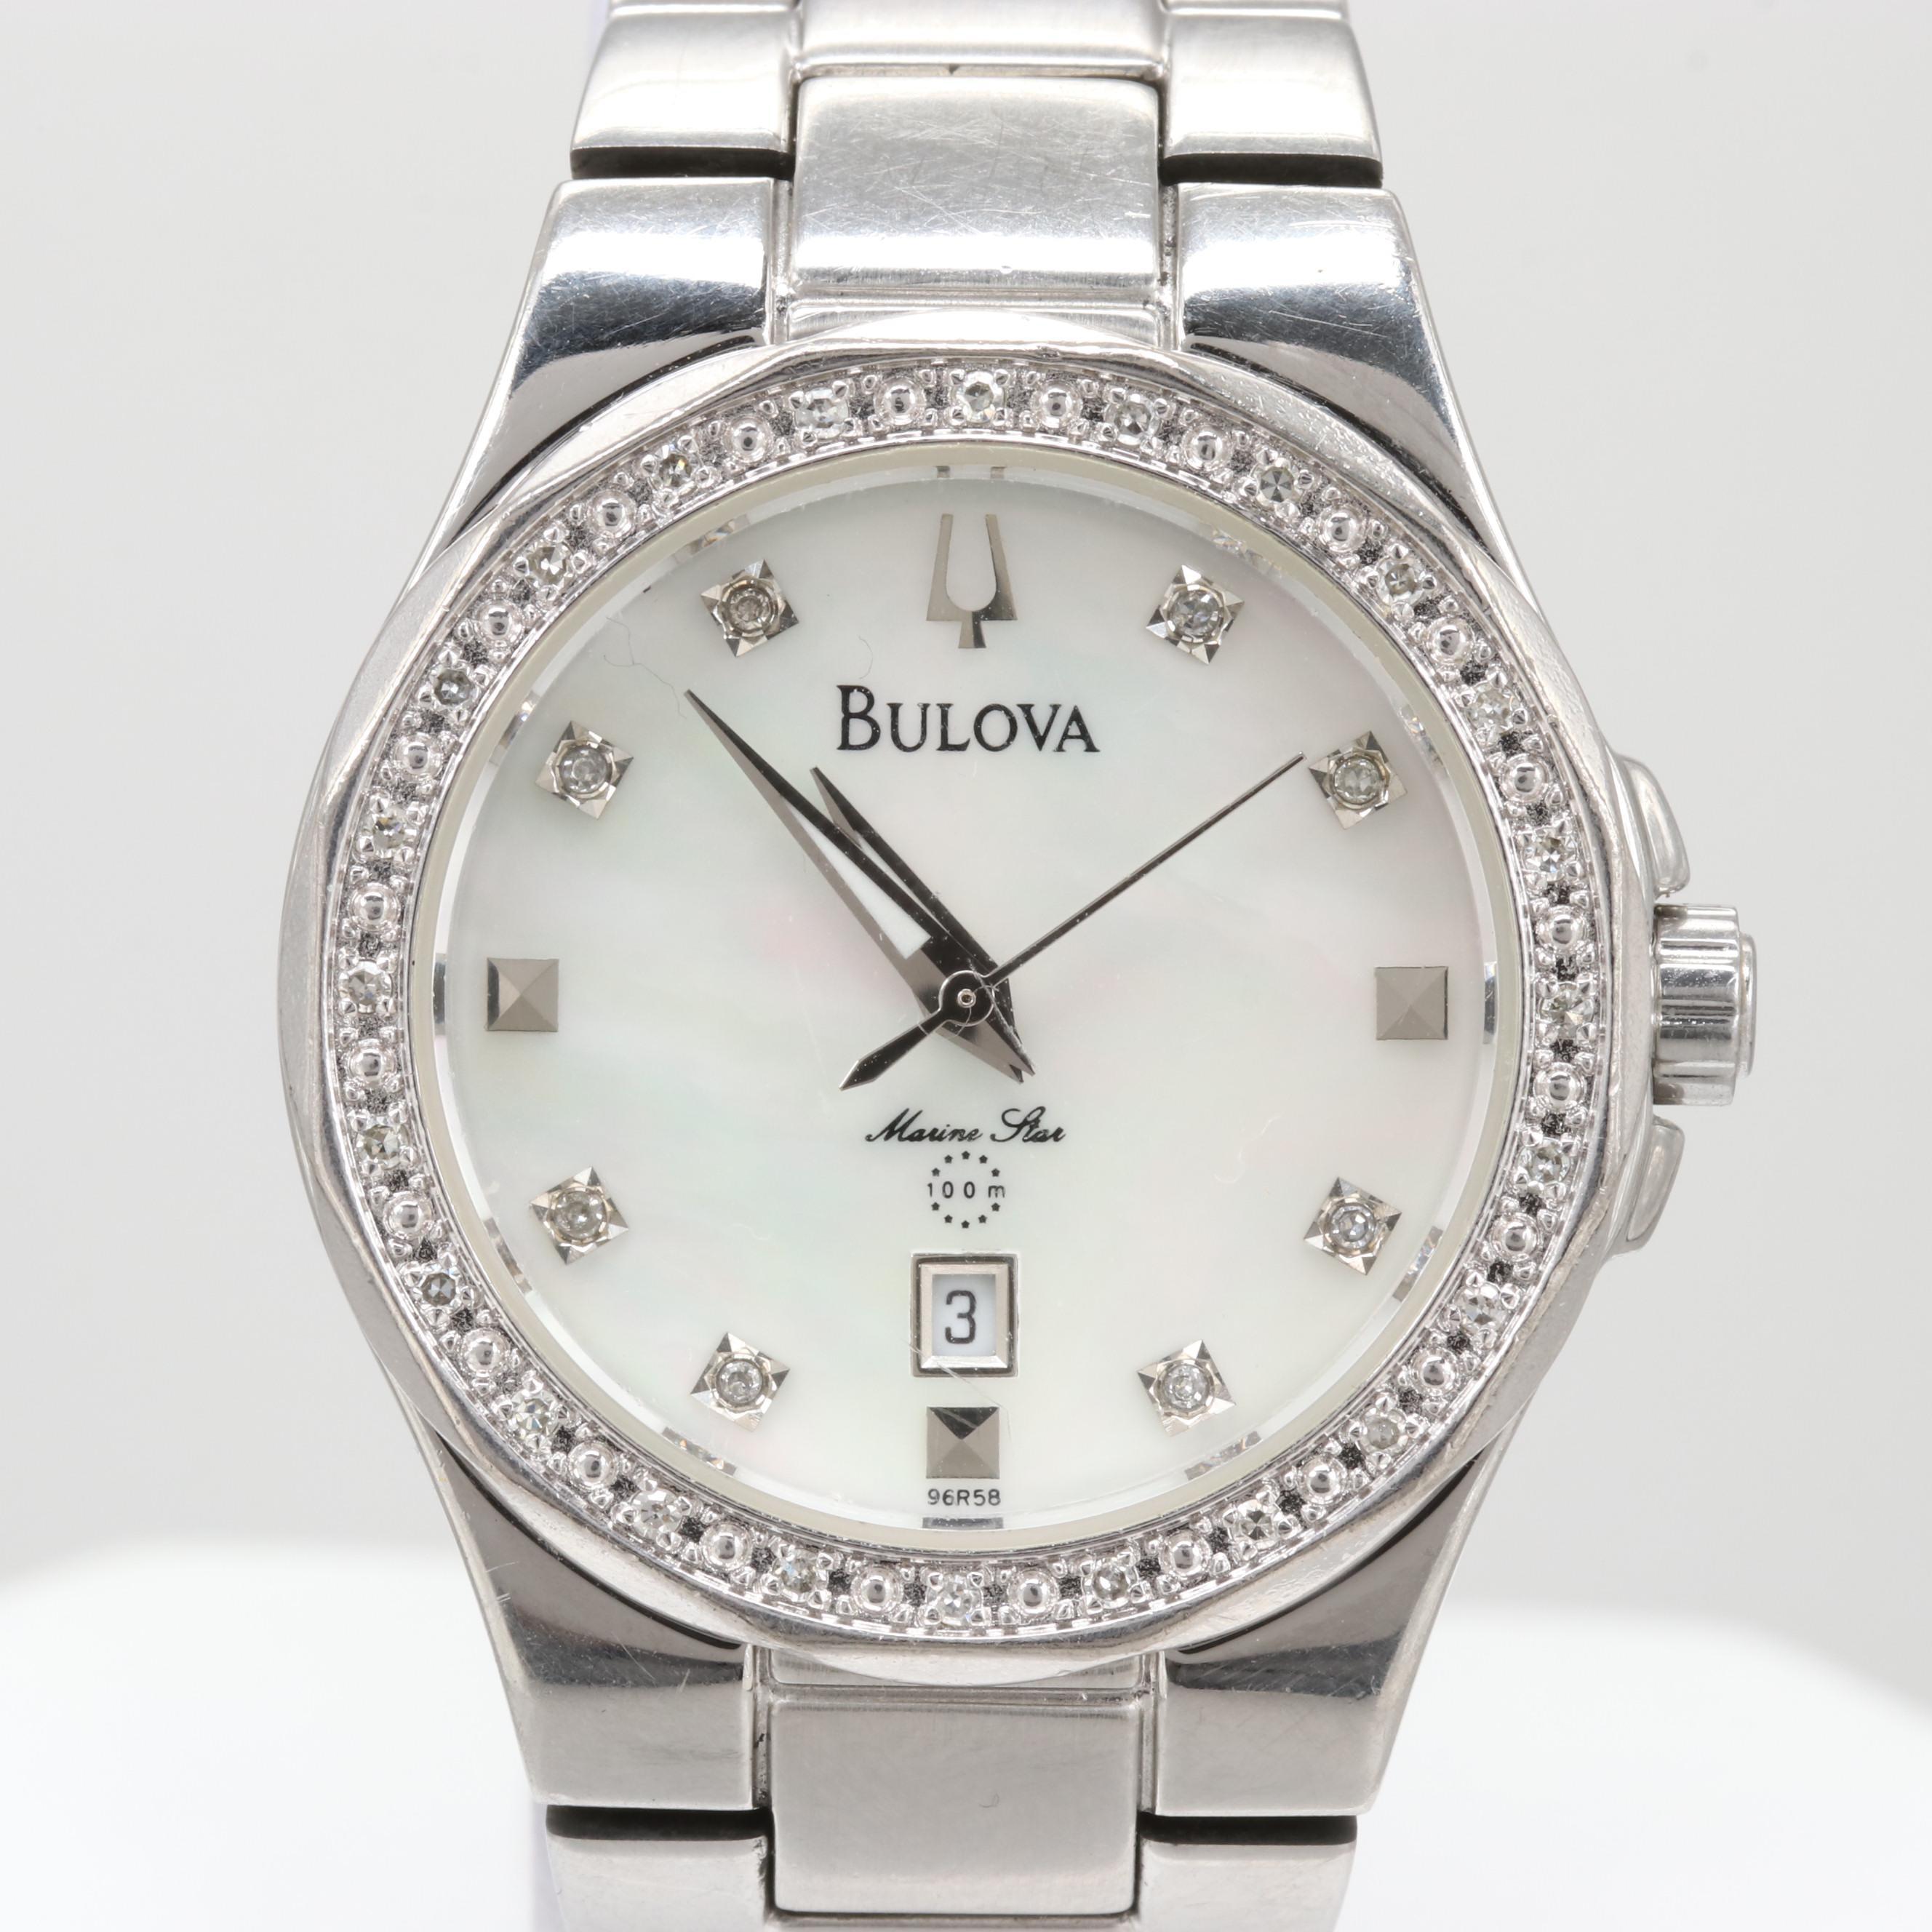 Bulova Marine Star Diamond and Mother of Pearl Wristwatch